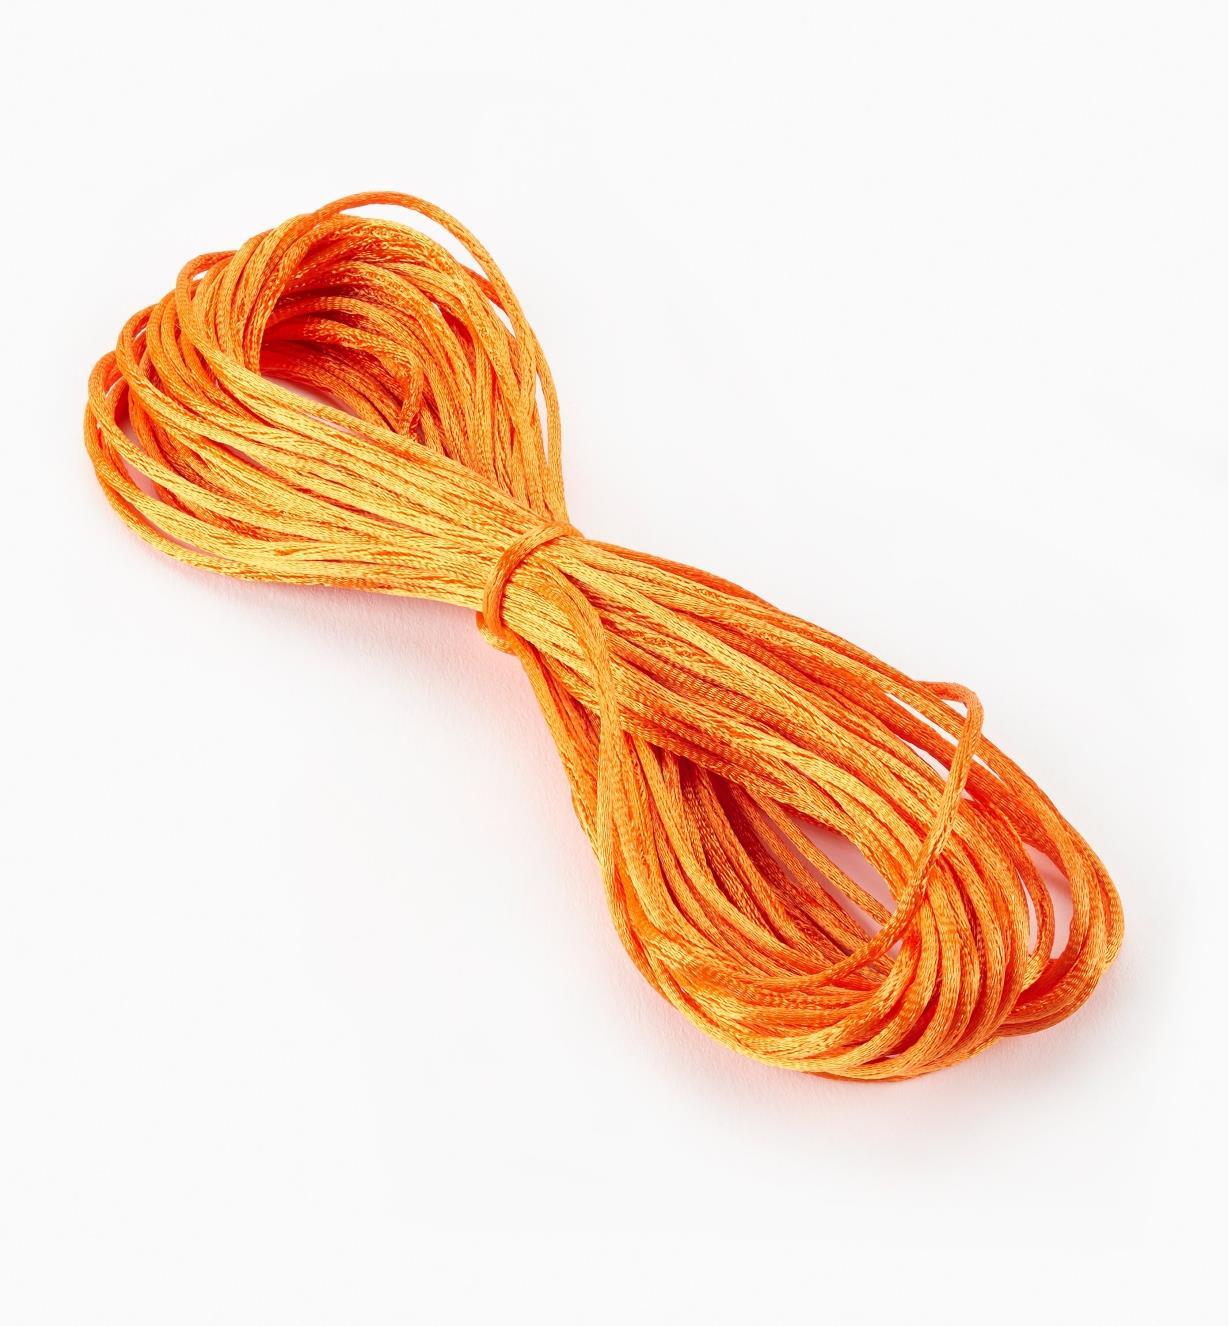 09A0708 - Orange Rattail Cord